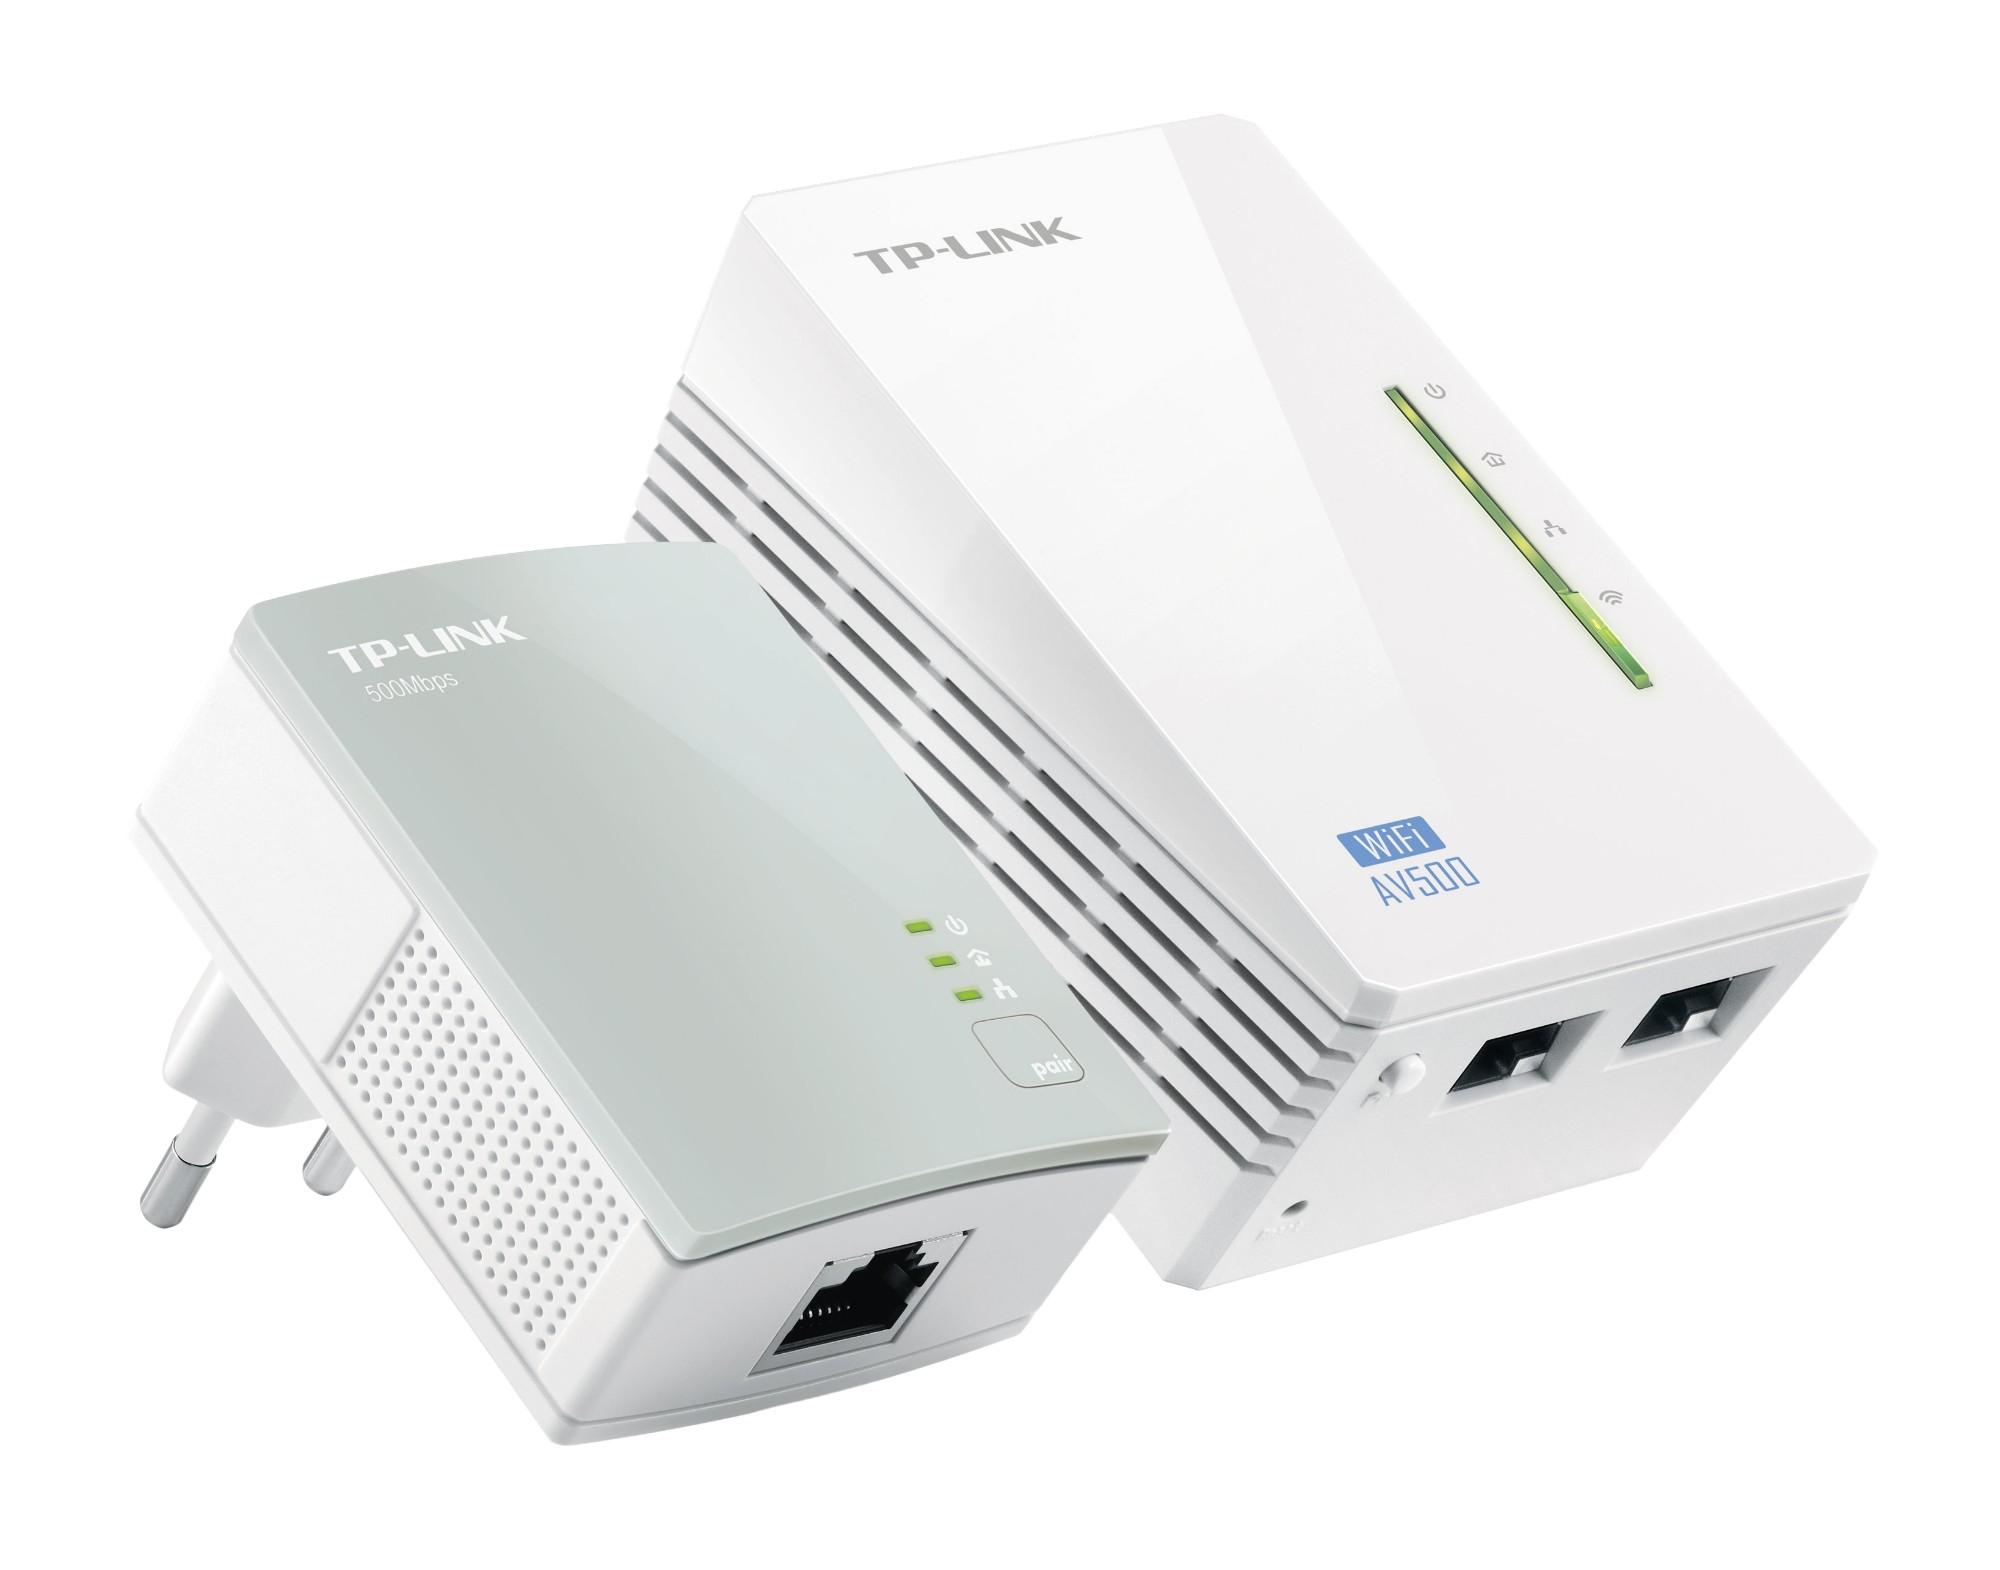 Wireless N Powerline Extender Tl-wpa4220 300mbps Kit Incl Tl-wpa4220 And Tl-pa4010